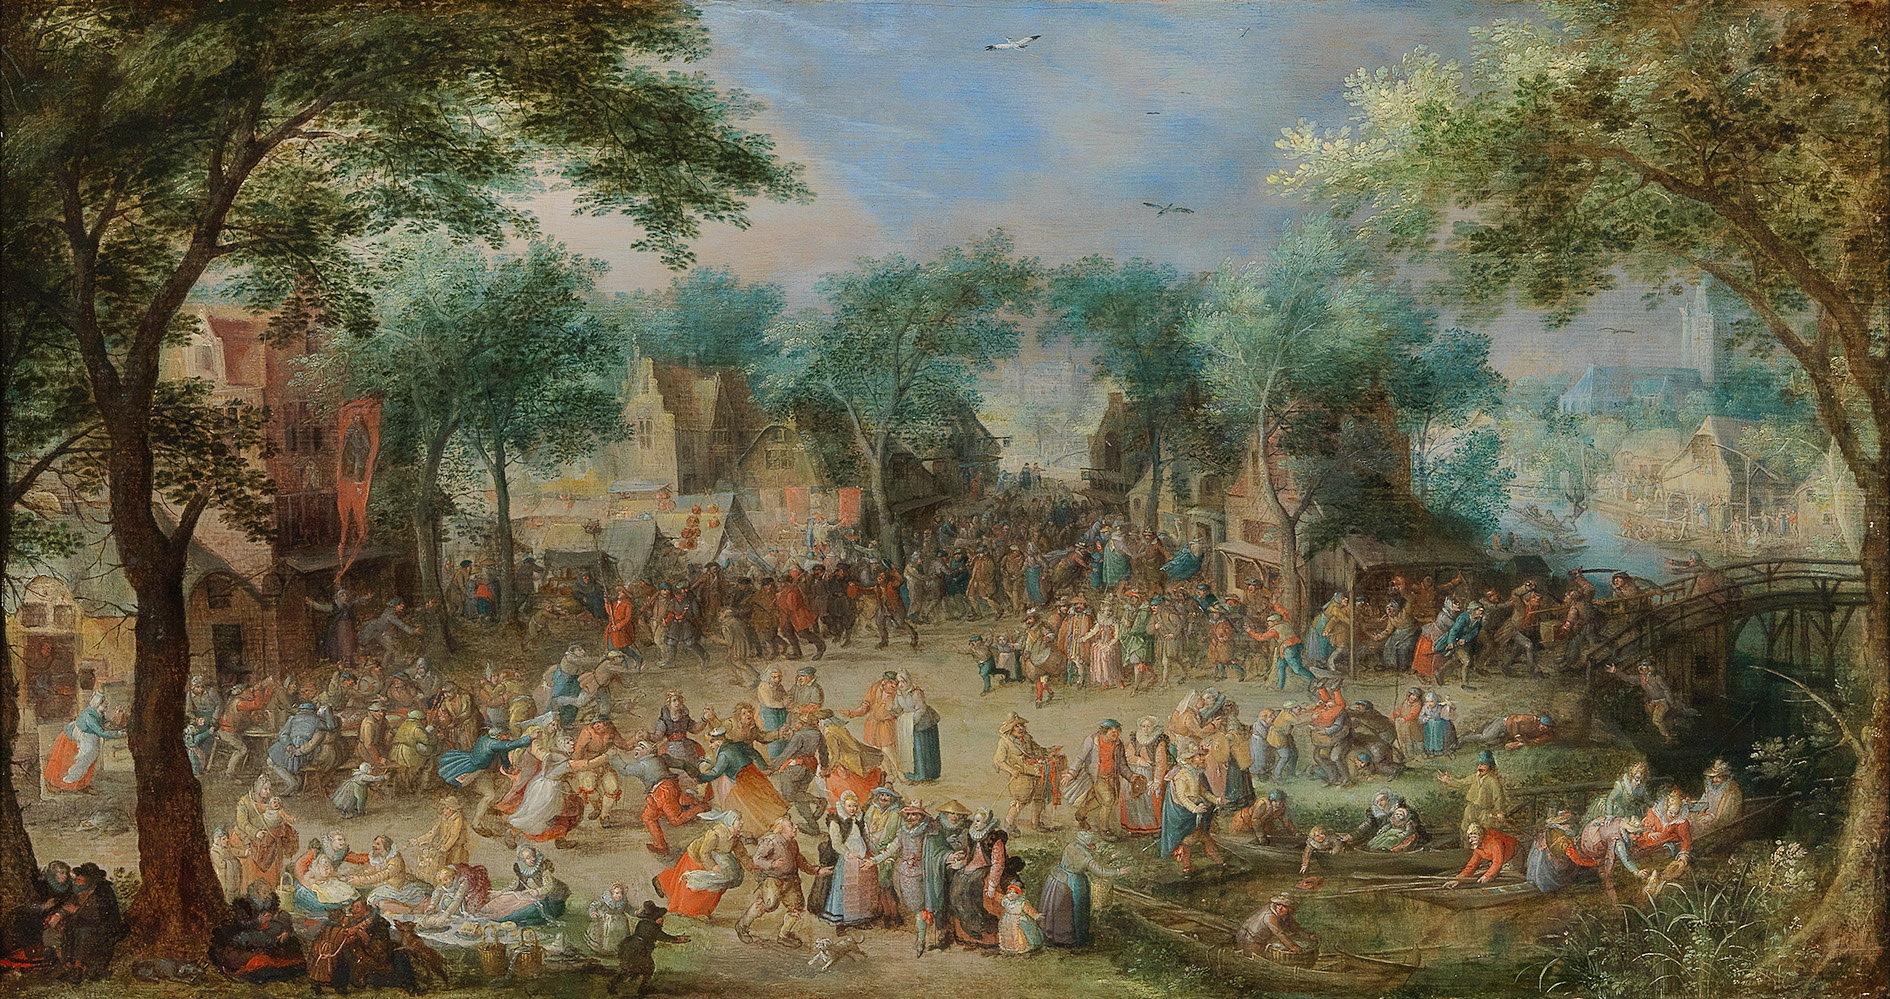 David Vinckboons (Mechelen 1576 – circa 1632) Saint George's Kermesse